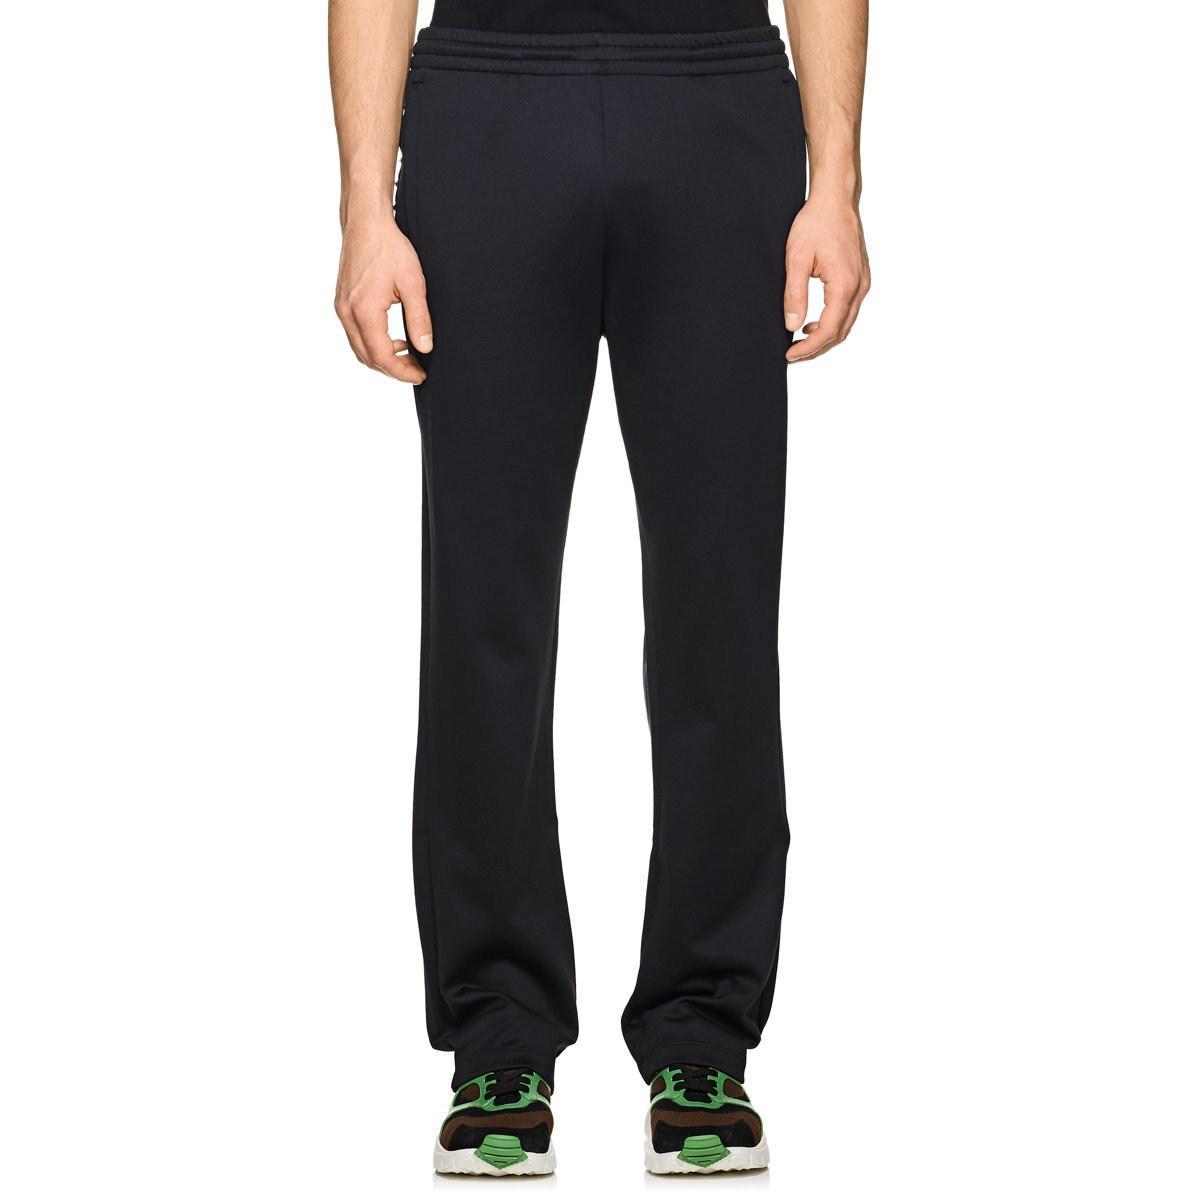 feee36cfca27 Lyst - Valentino Rockstud Track Pants in Black for Men